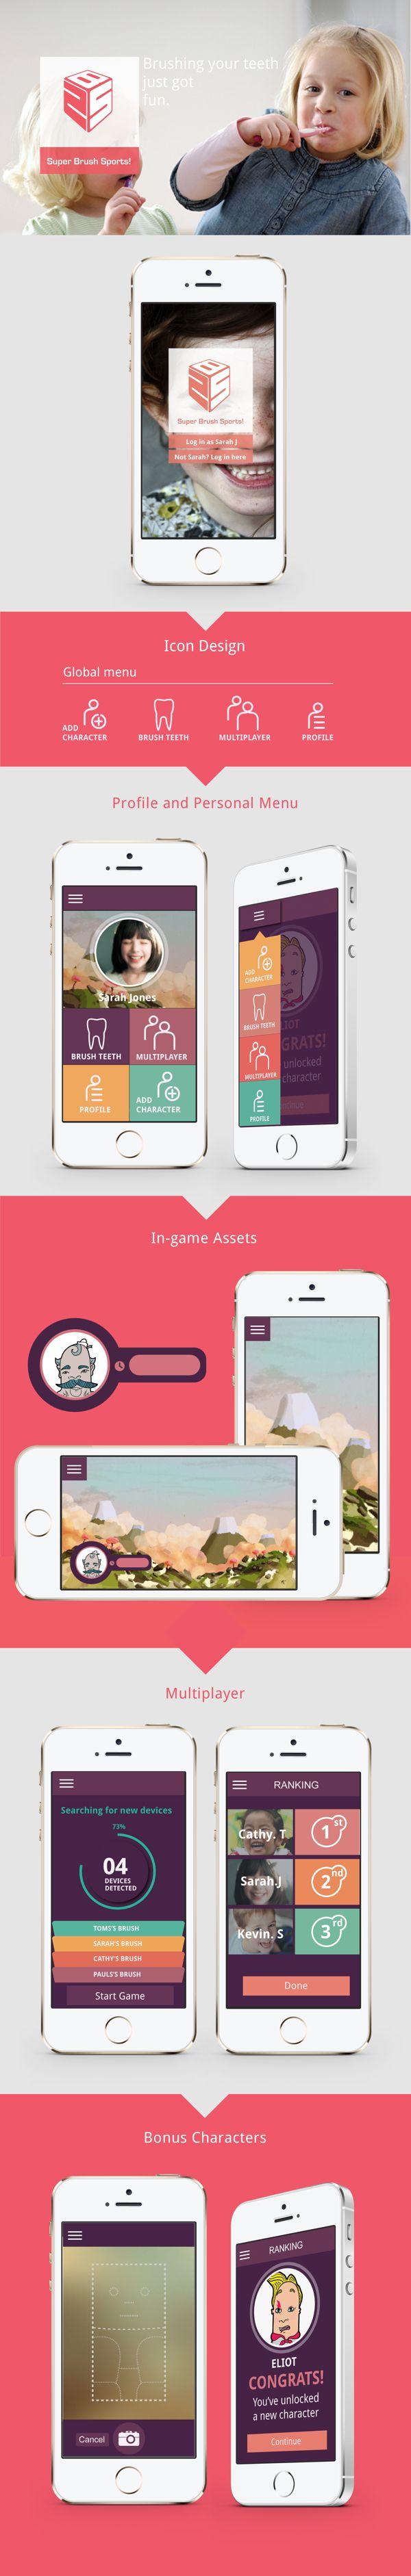 Super Brush Sports! Mobile Game by Morgan Mulvaney, via Behance